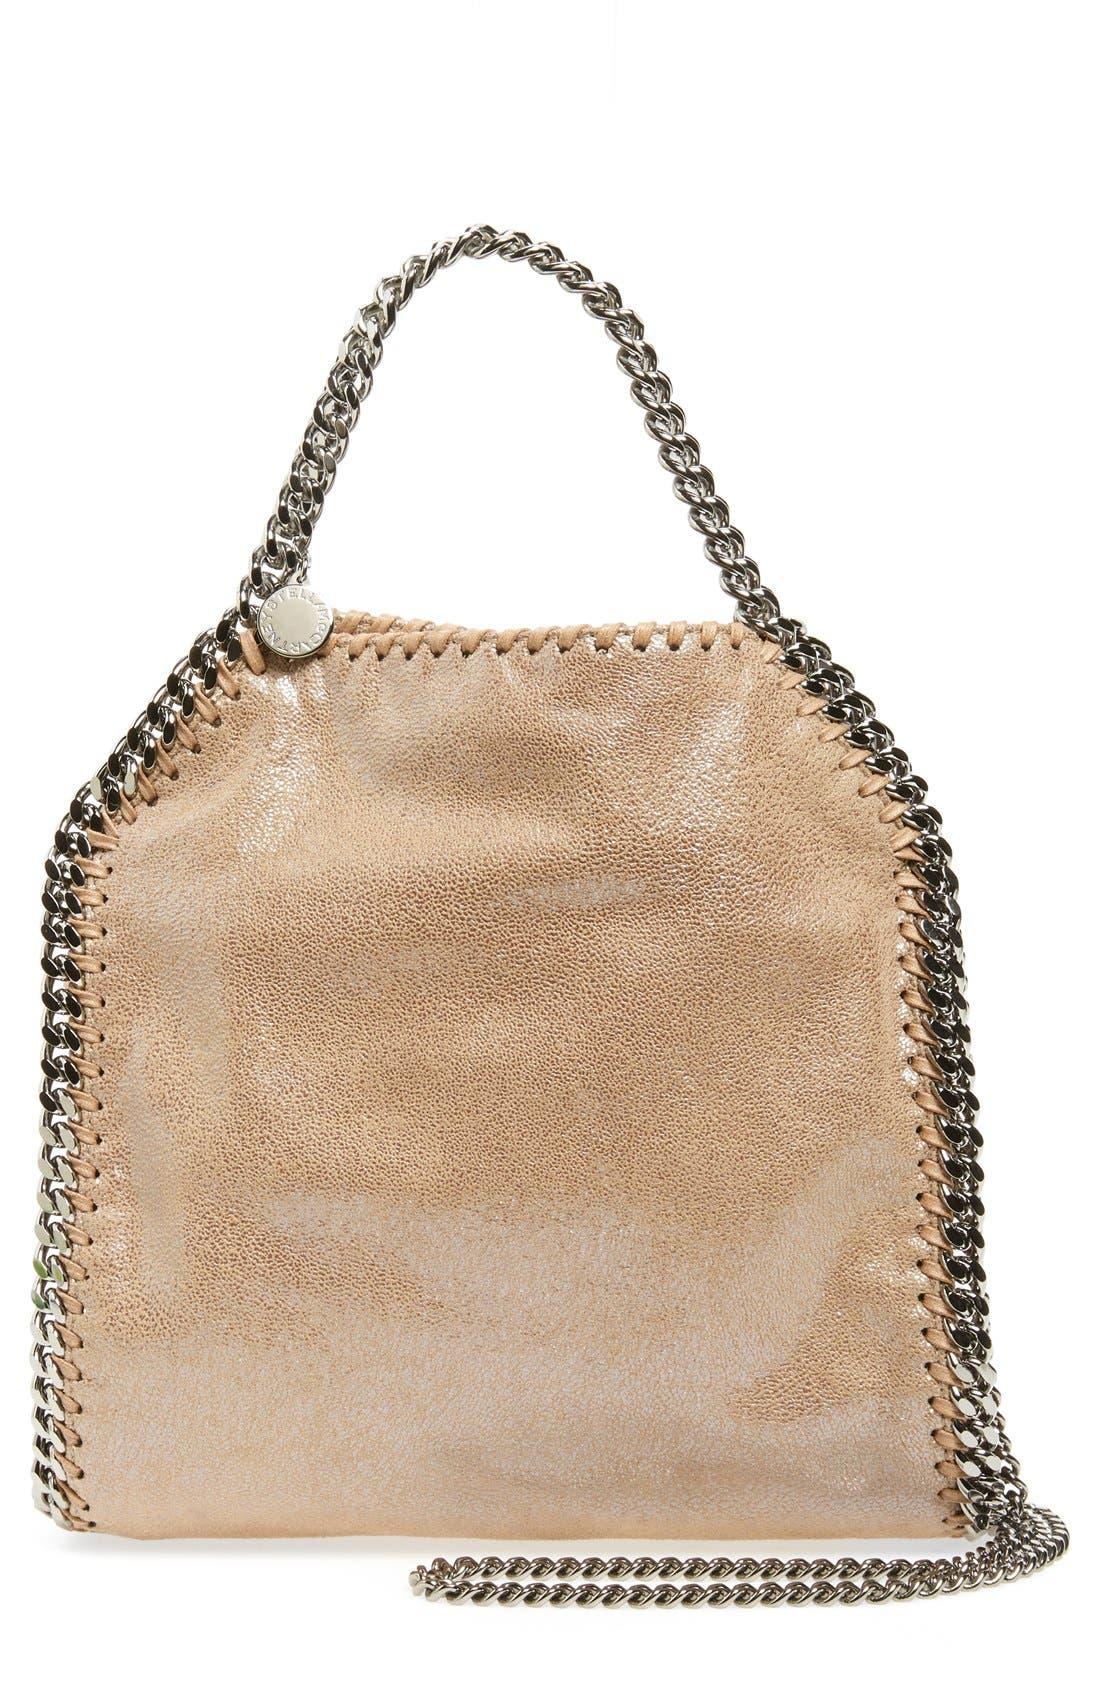 Alternate Image 1 Selected - Stella McCartney 'Mini Falabella' Faux Leather Crossbody Bag